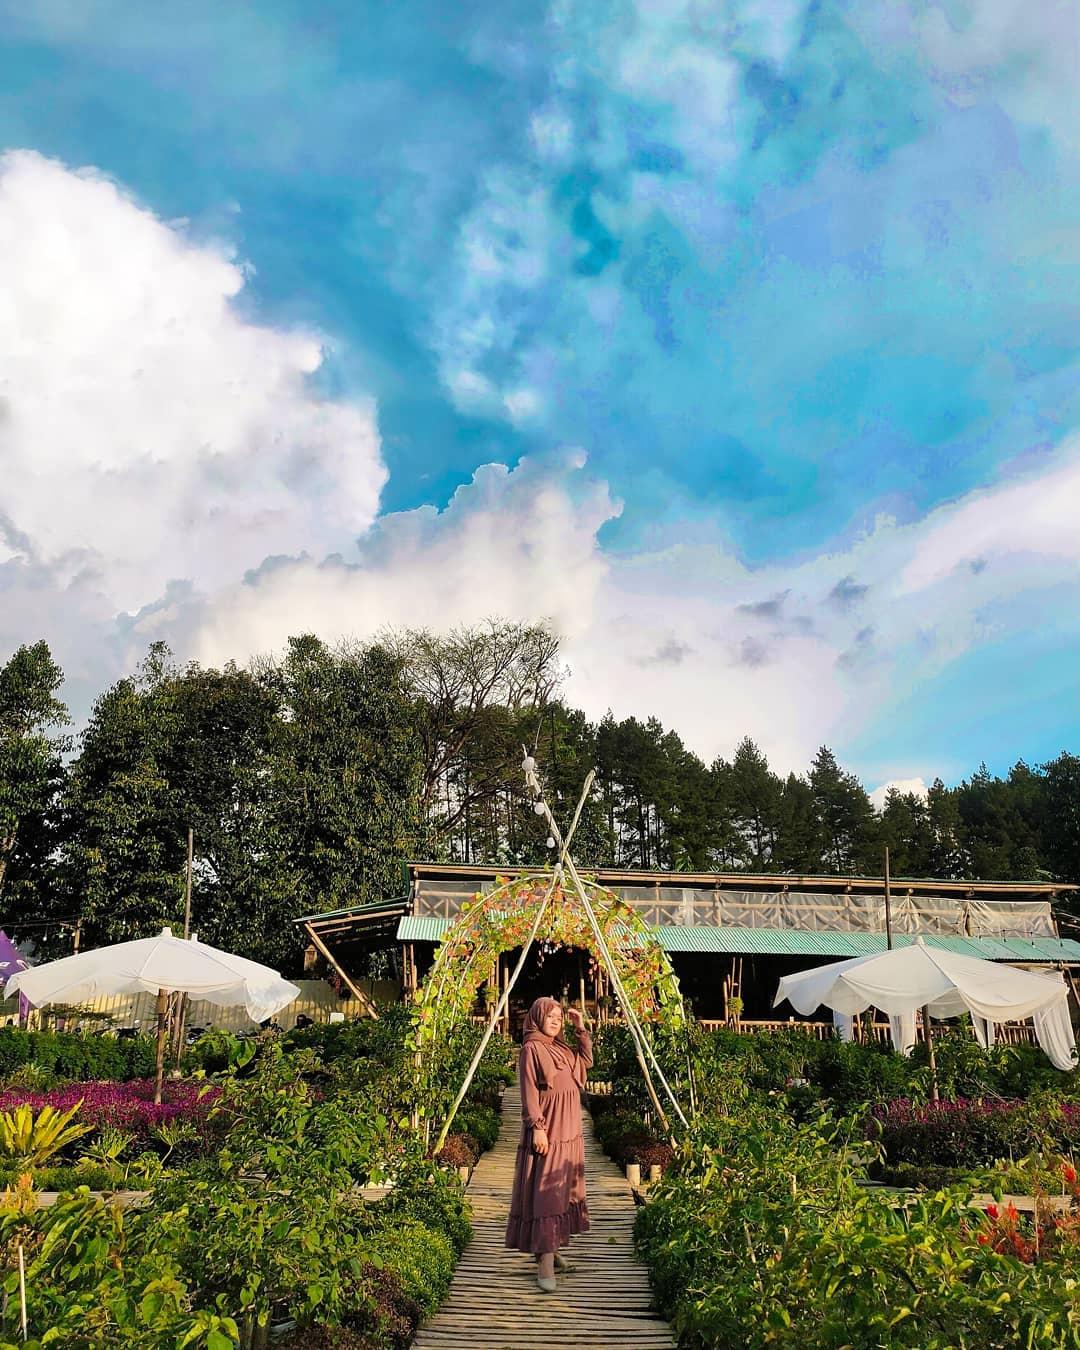 Berfoto Di Tapos Garden Image From @sitirahmaa2807